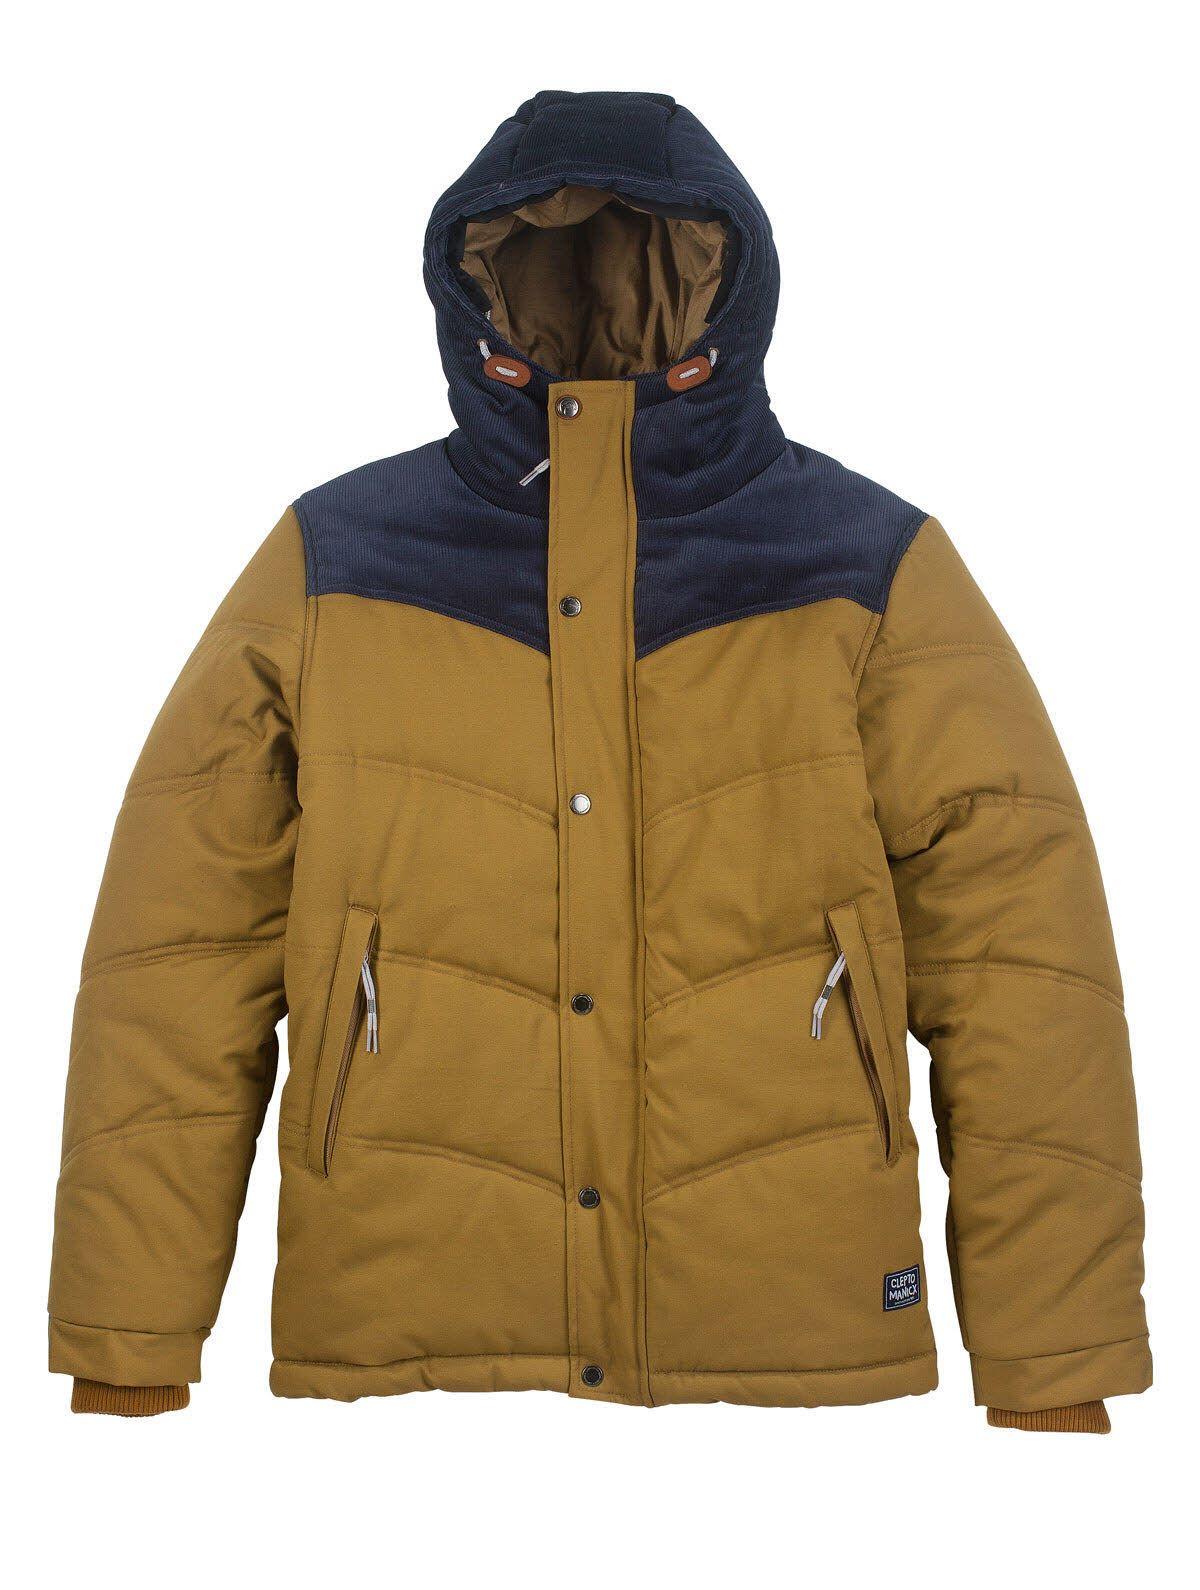 Cleptomanicx Jackets Winterjacken Jacket Cc LWinter gIYfb67yv